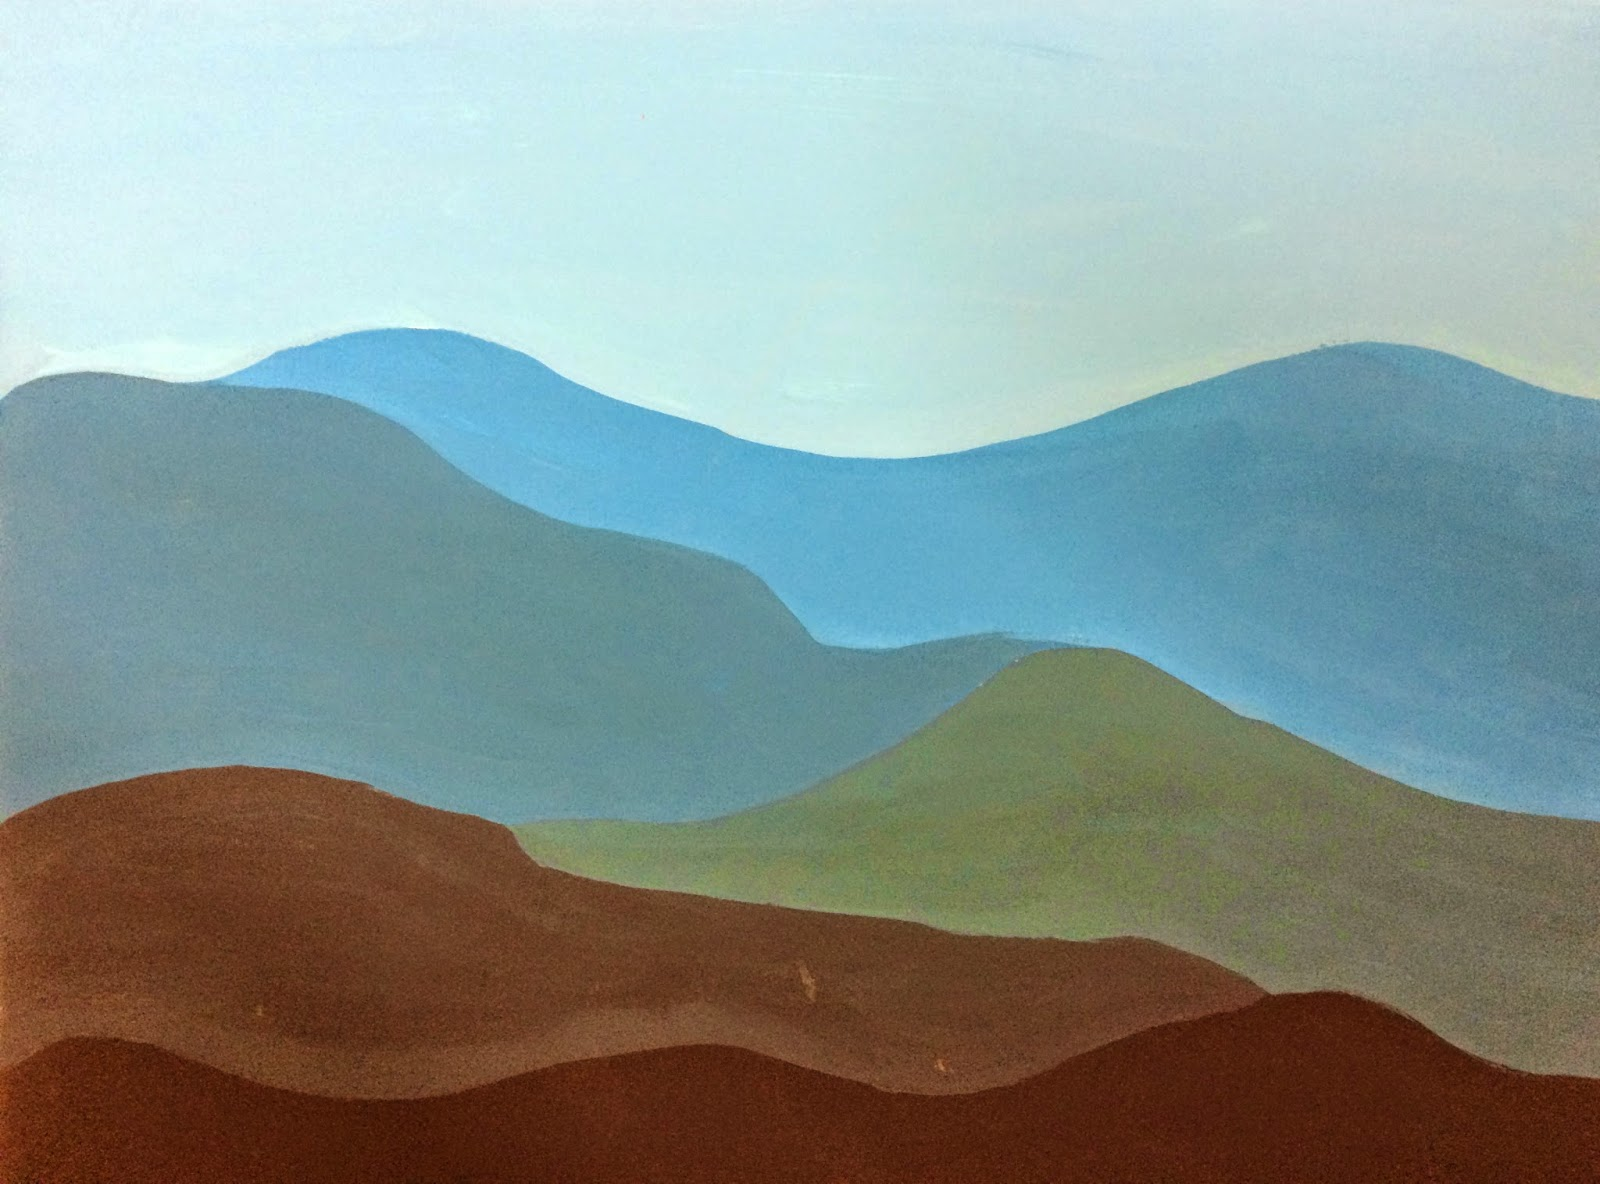 8th Grade Color Value Landscapes | Mrs. Boydston's SpARTan ...